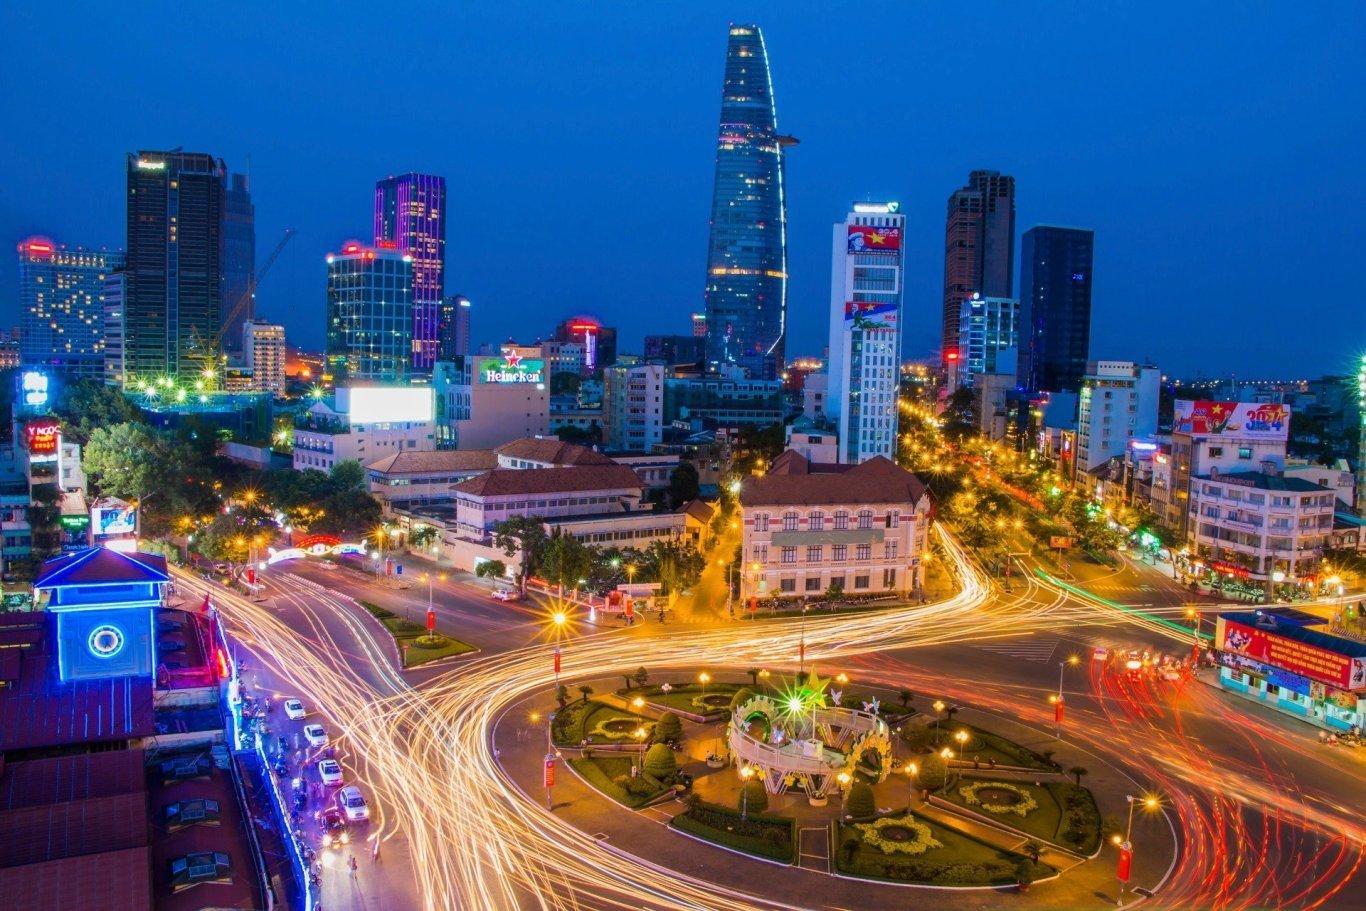 10-Day Vietnam Grand Prix & North to South Sightseeing - Vietnam Itinerary